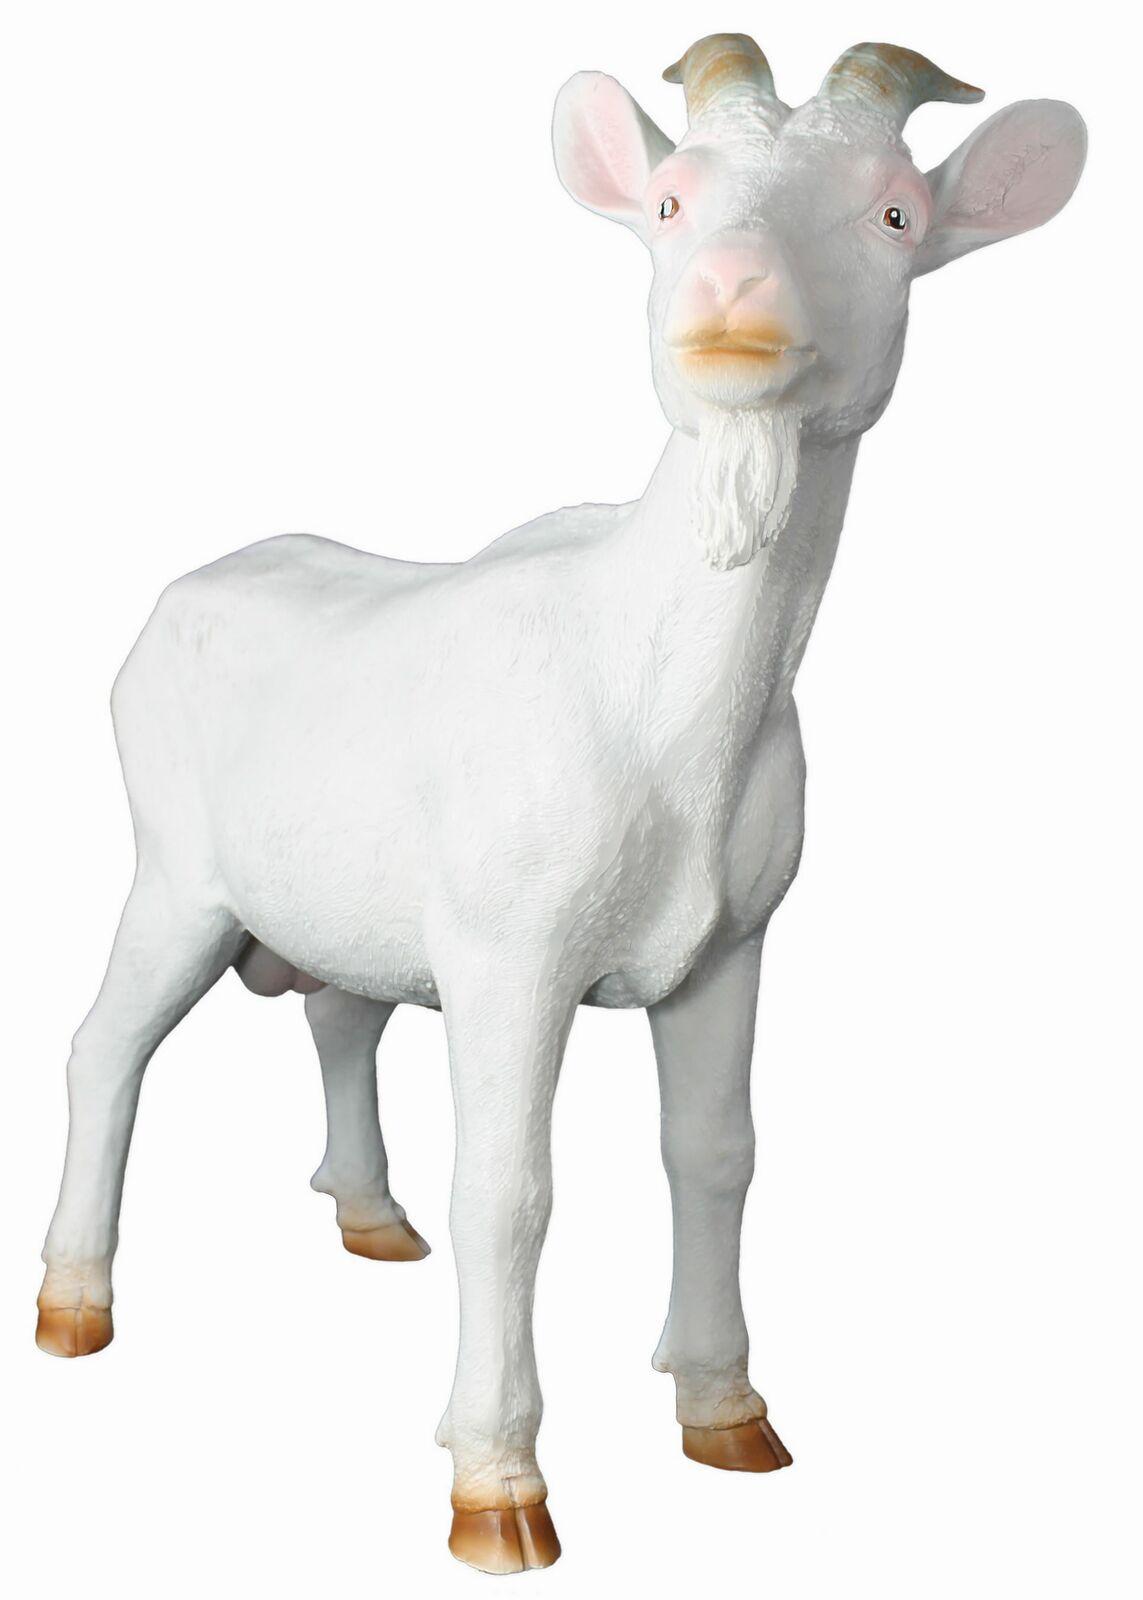 El látigo figura el látigo  Bruce  blancoo jardín personaje animal personaje cabra dekofigur